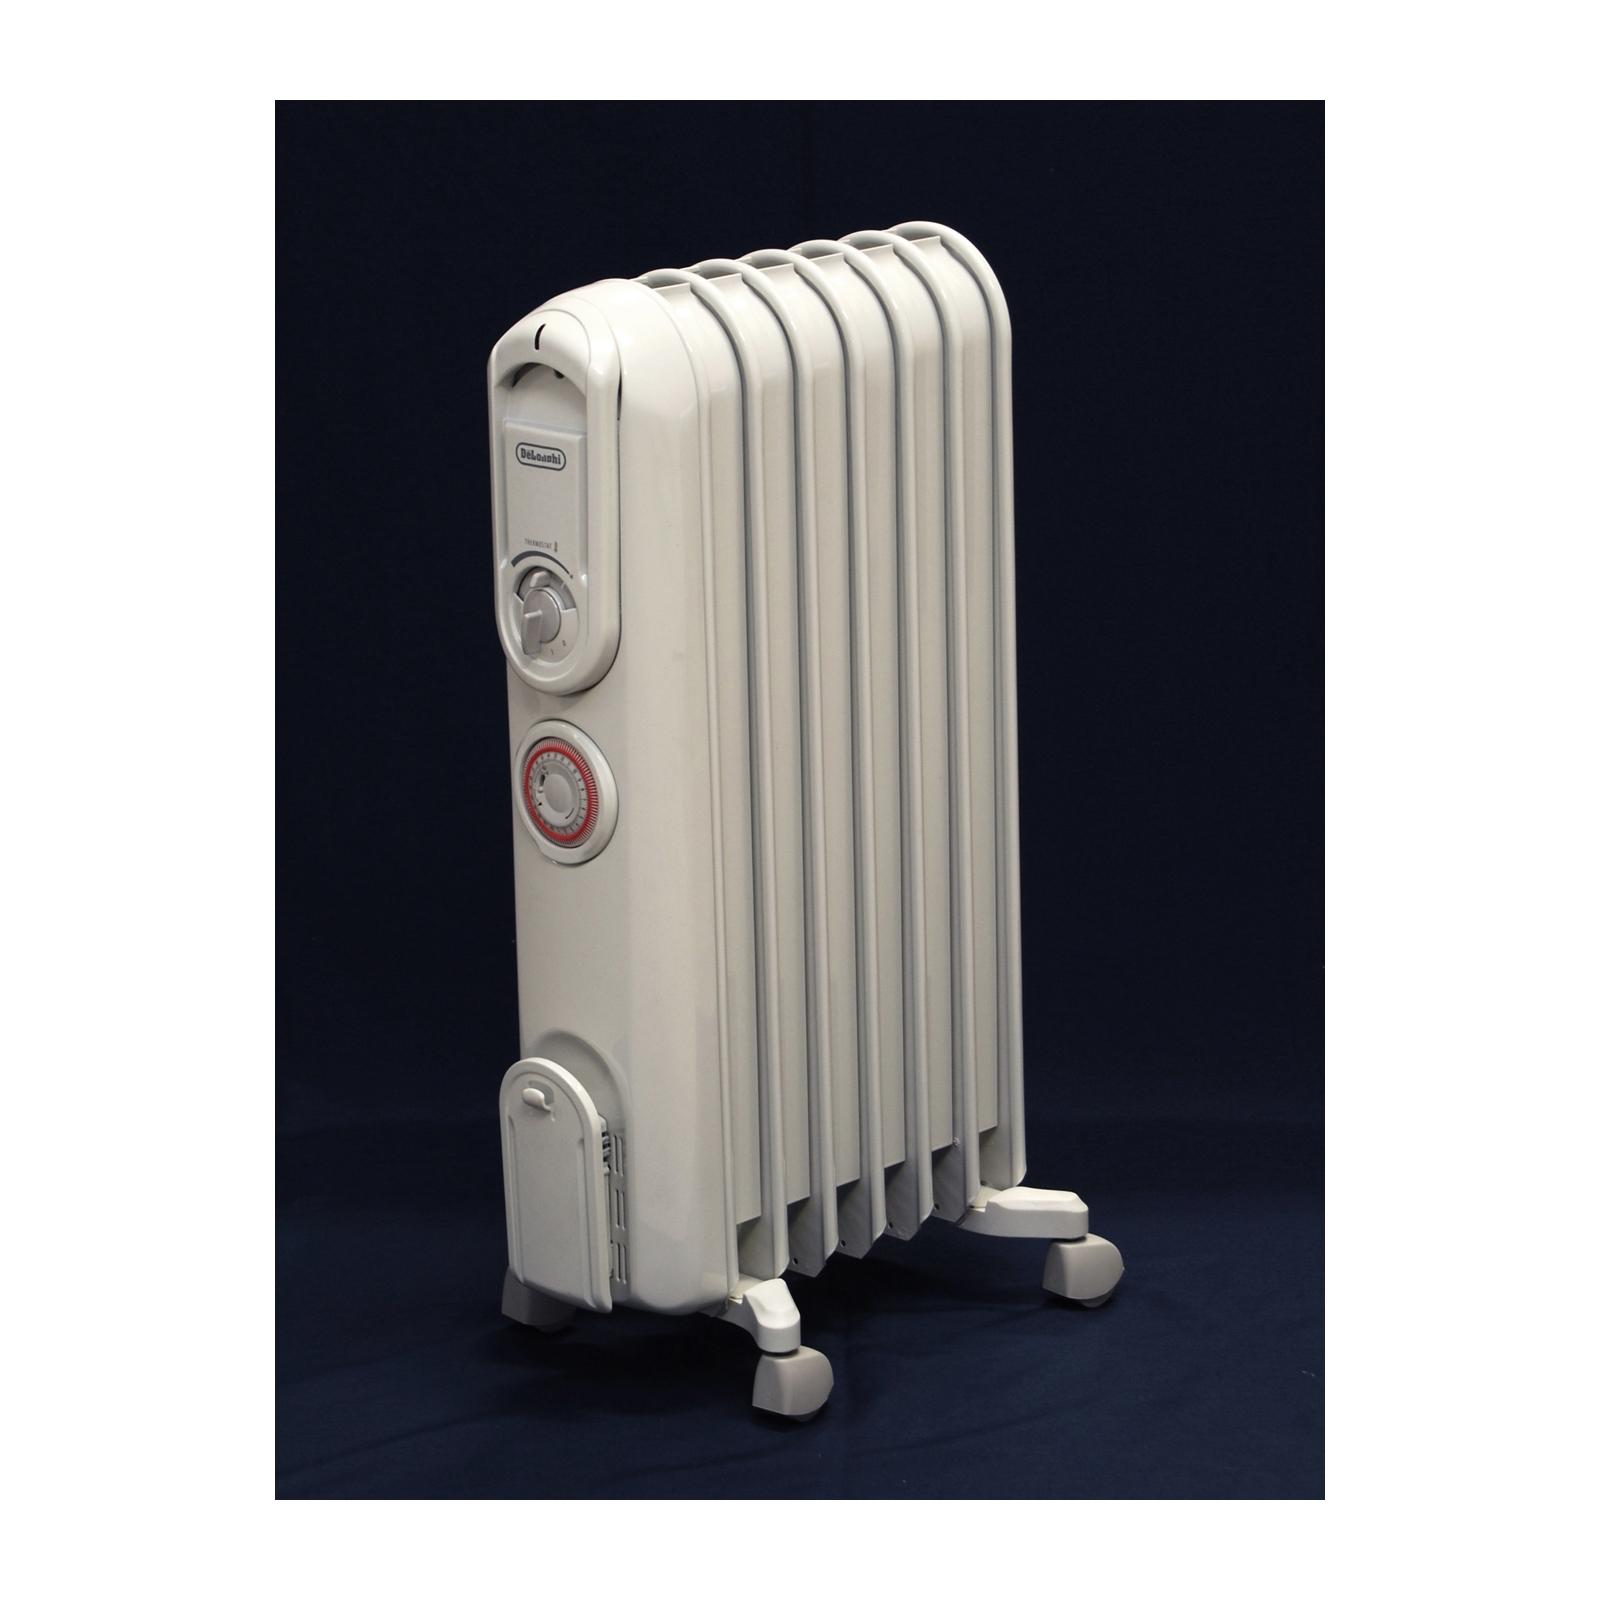 DeLonghiVentoHeater lakewood heater wiring diagram wiring diagrams for dummies \u2022